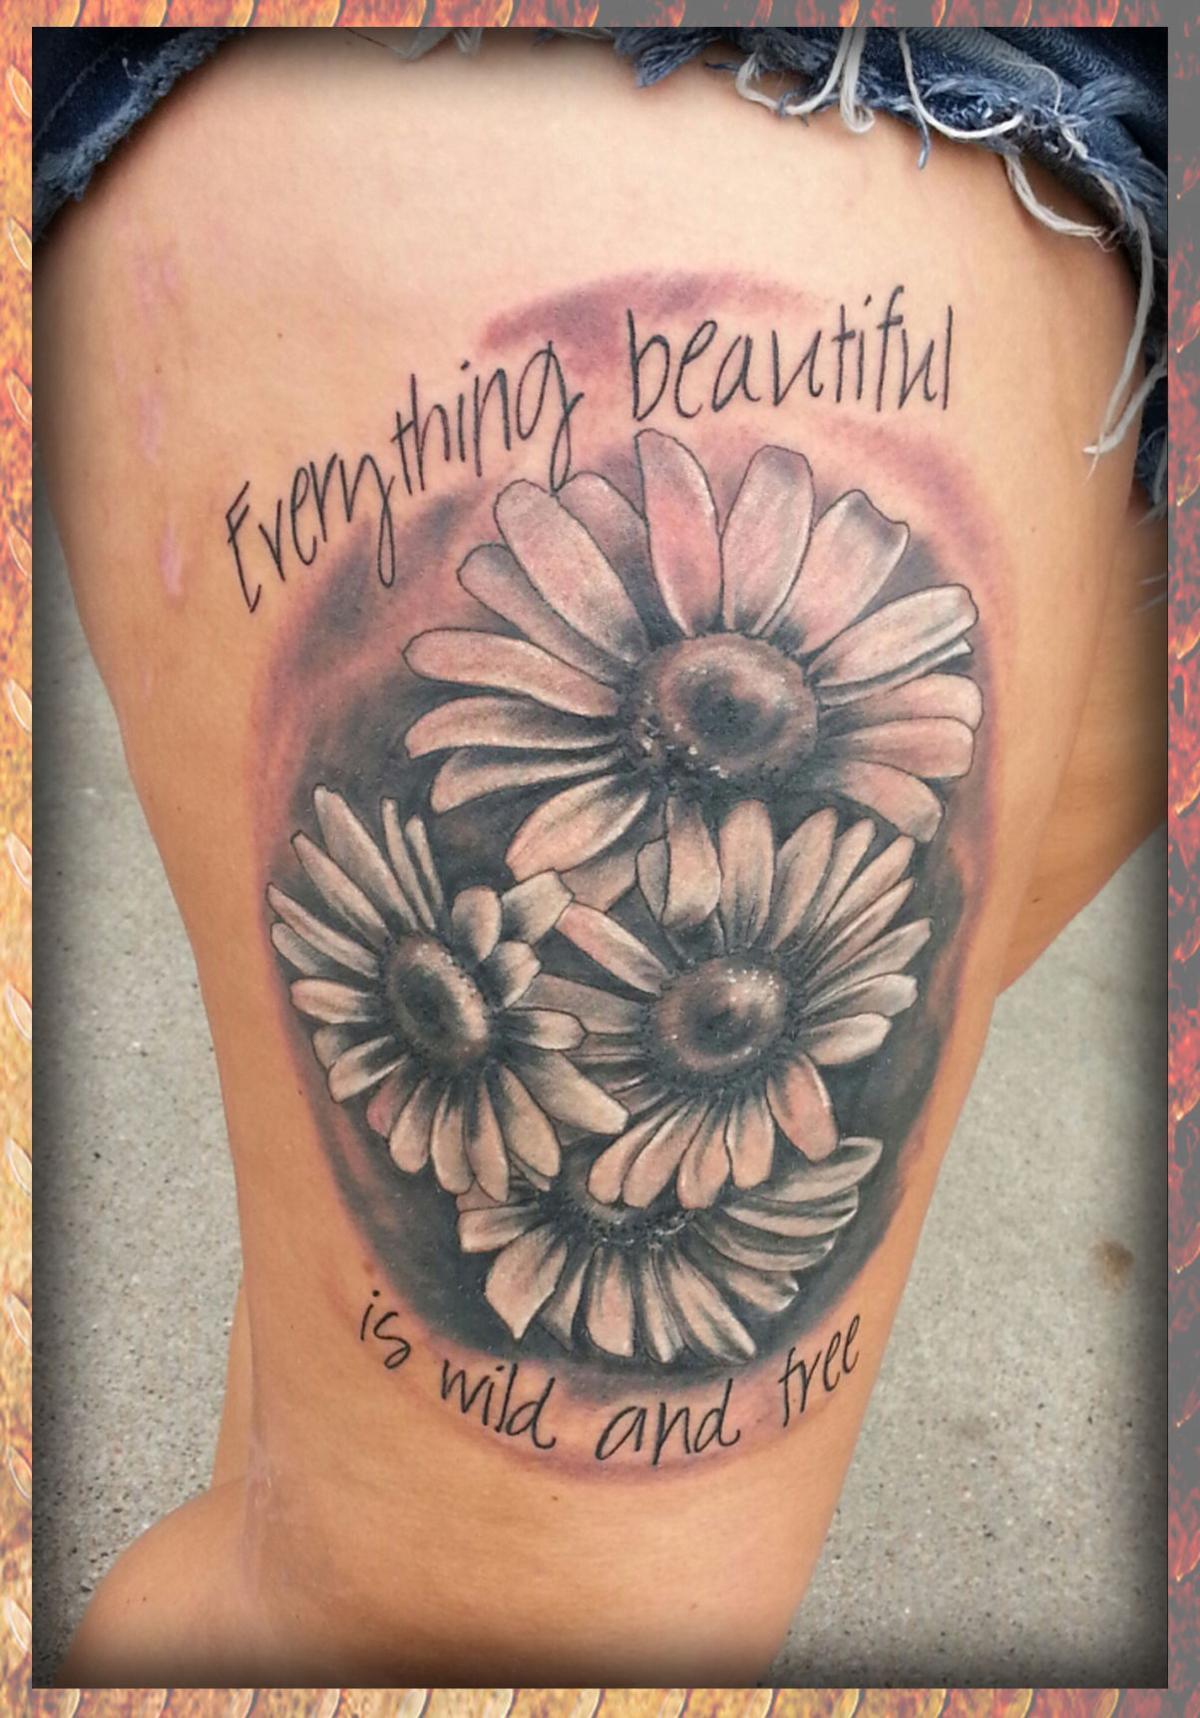 Eternal tattoo and body piercing tattoo tattoo artists for Eternal tattoo fremont